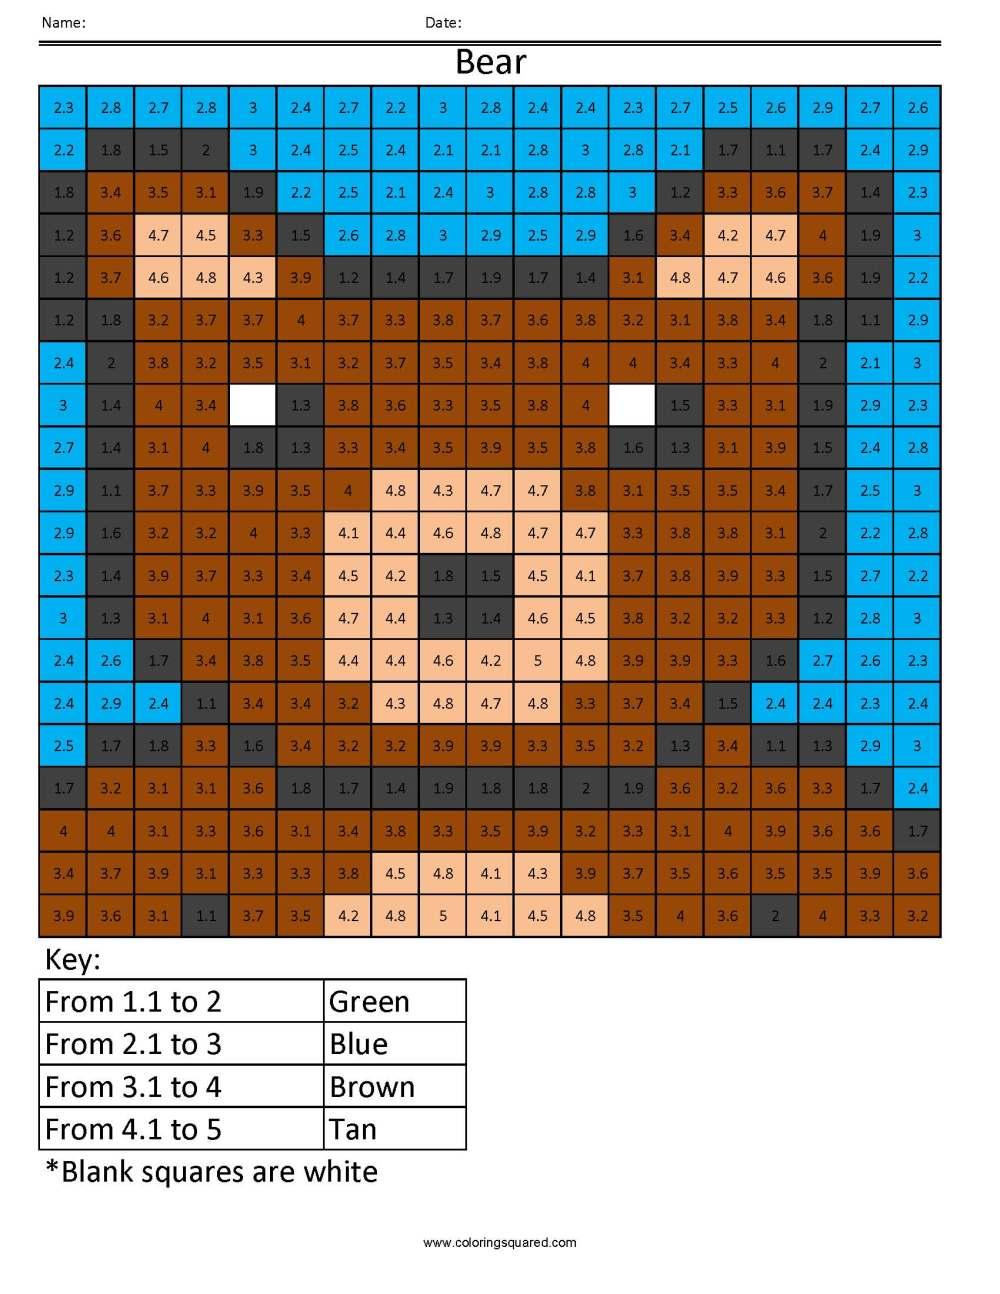 medium resolution of DP1 Bear Color free fractions decimals percent worksheet - Coloring Squared